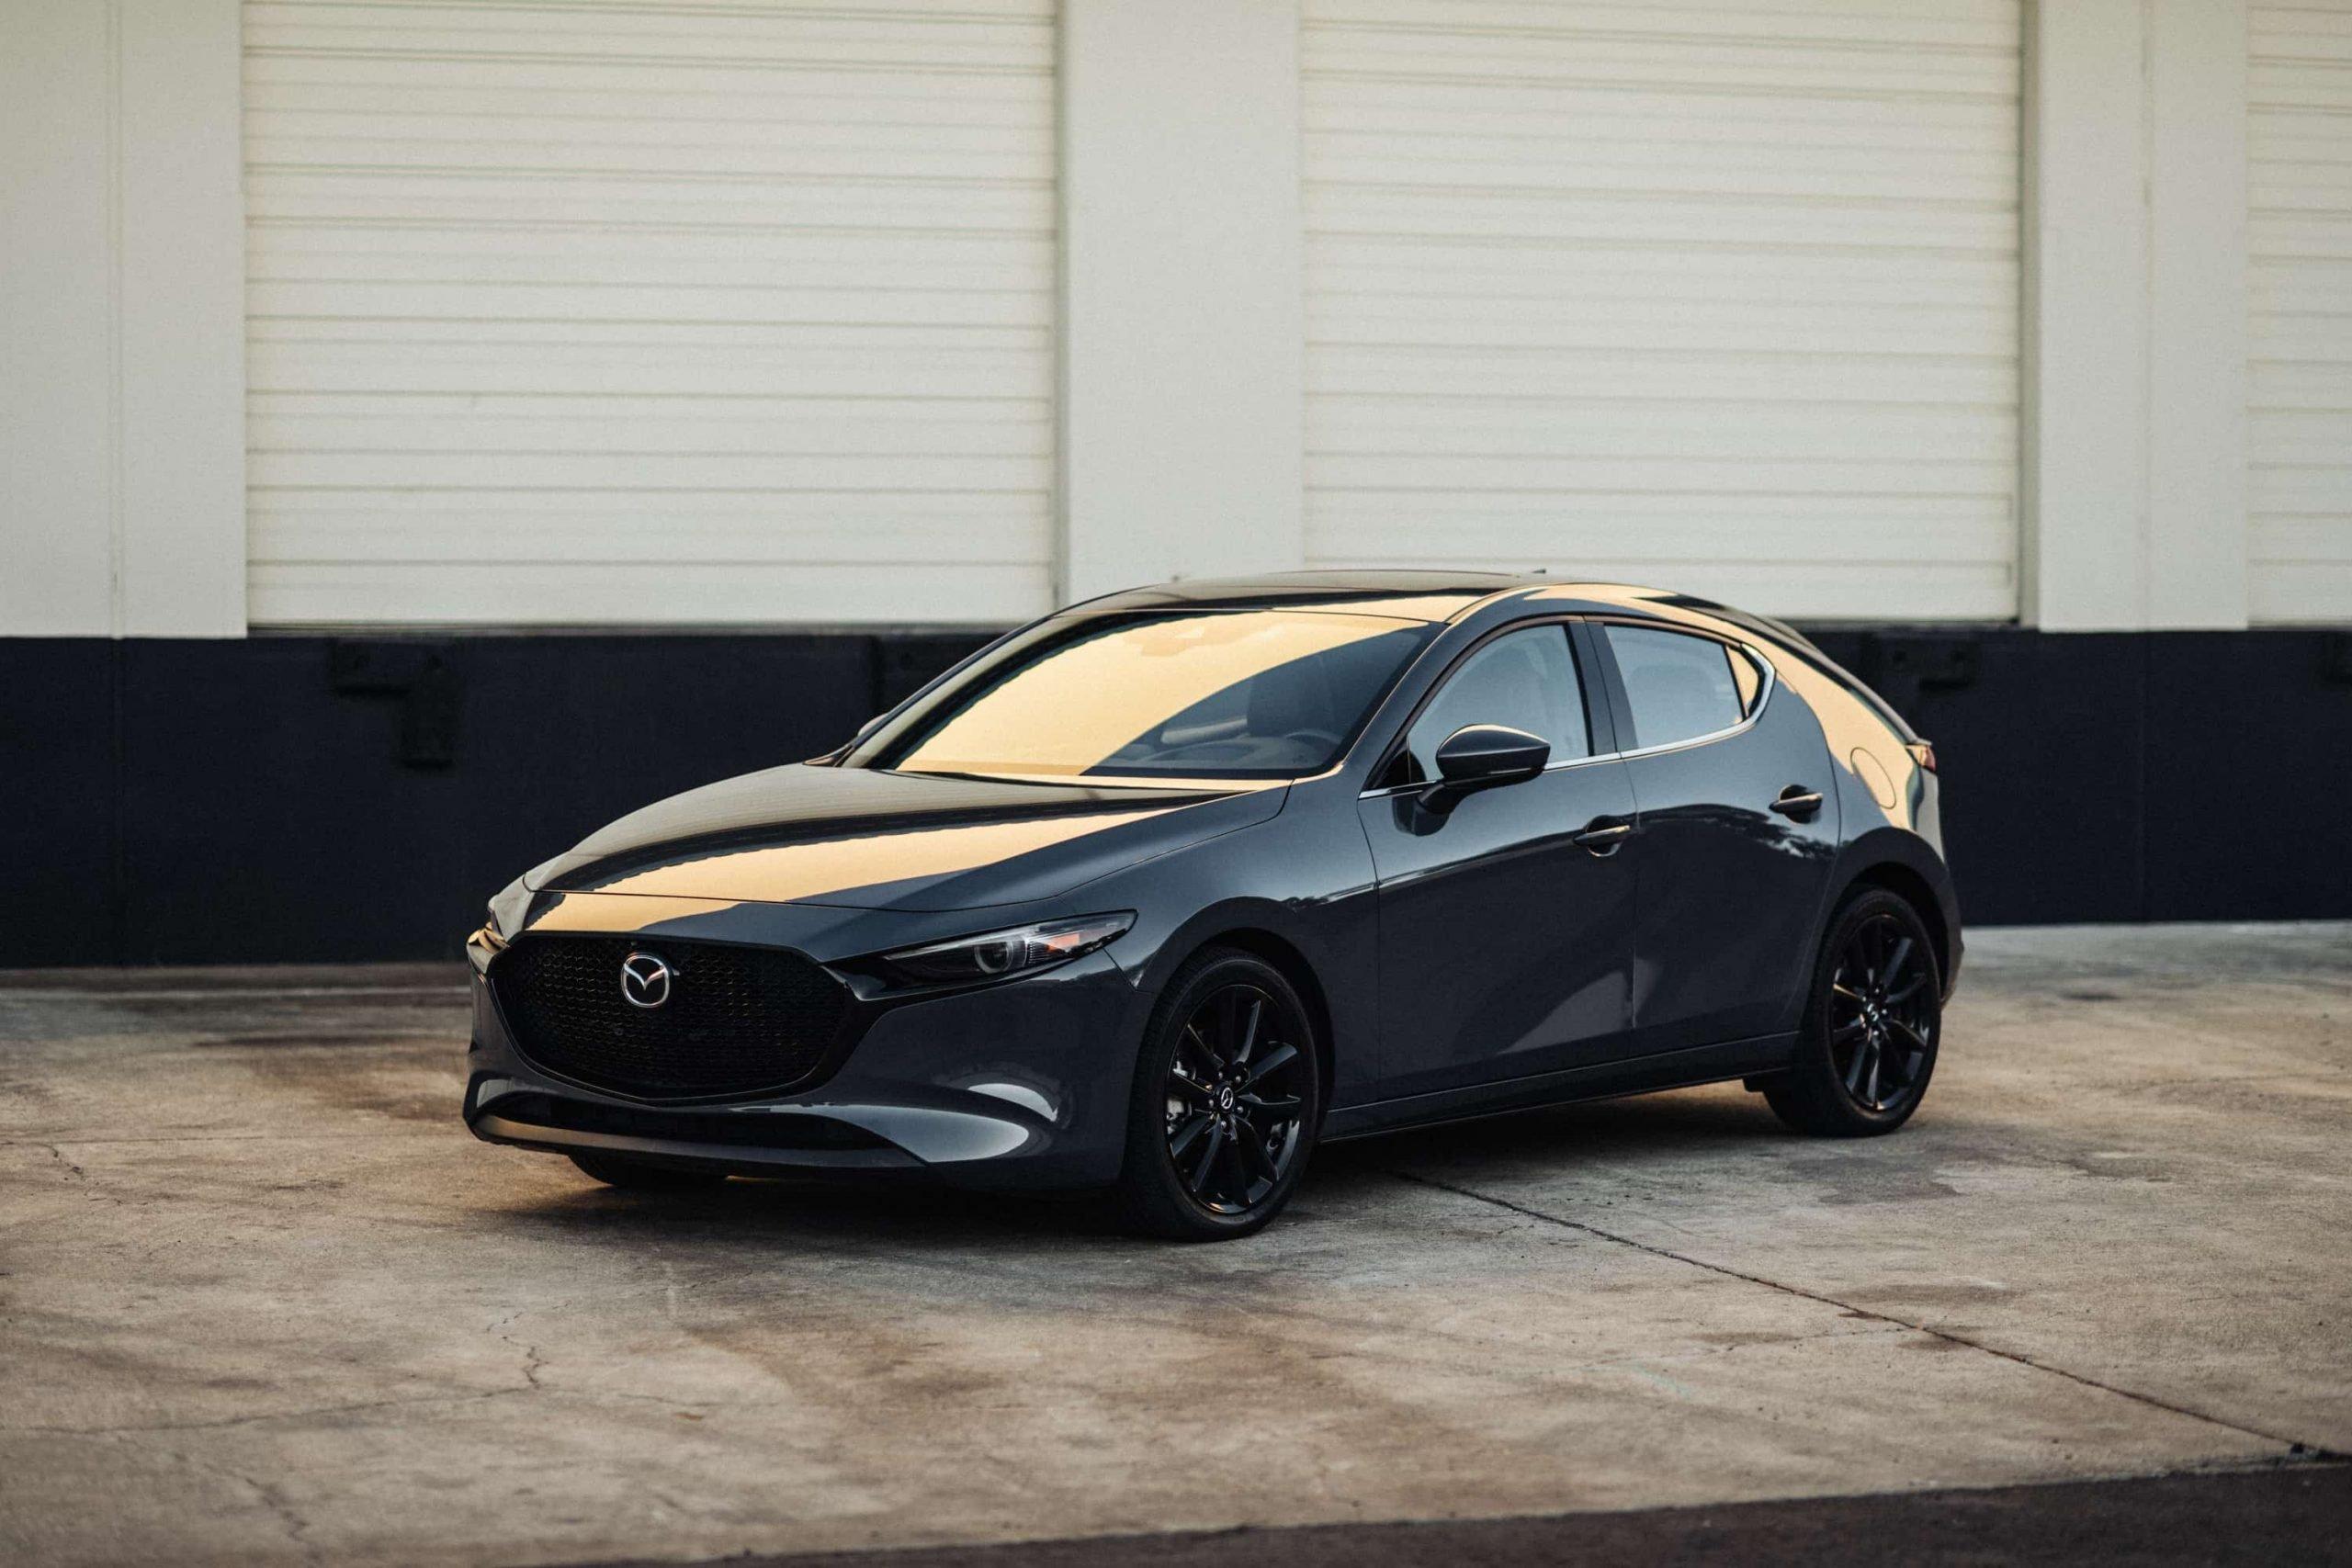 2021 Mazda 3 Sedan Research New